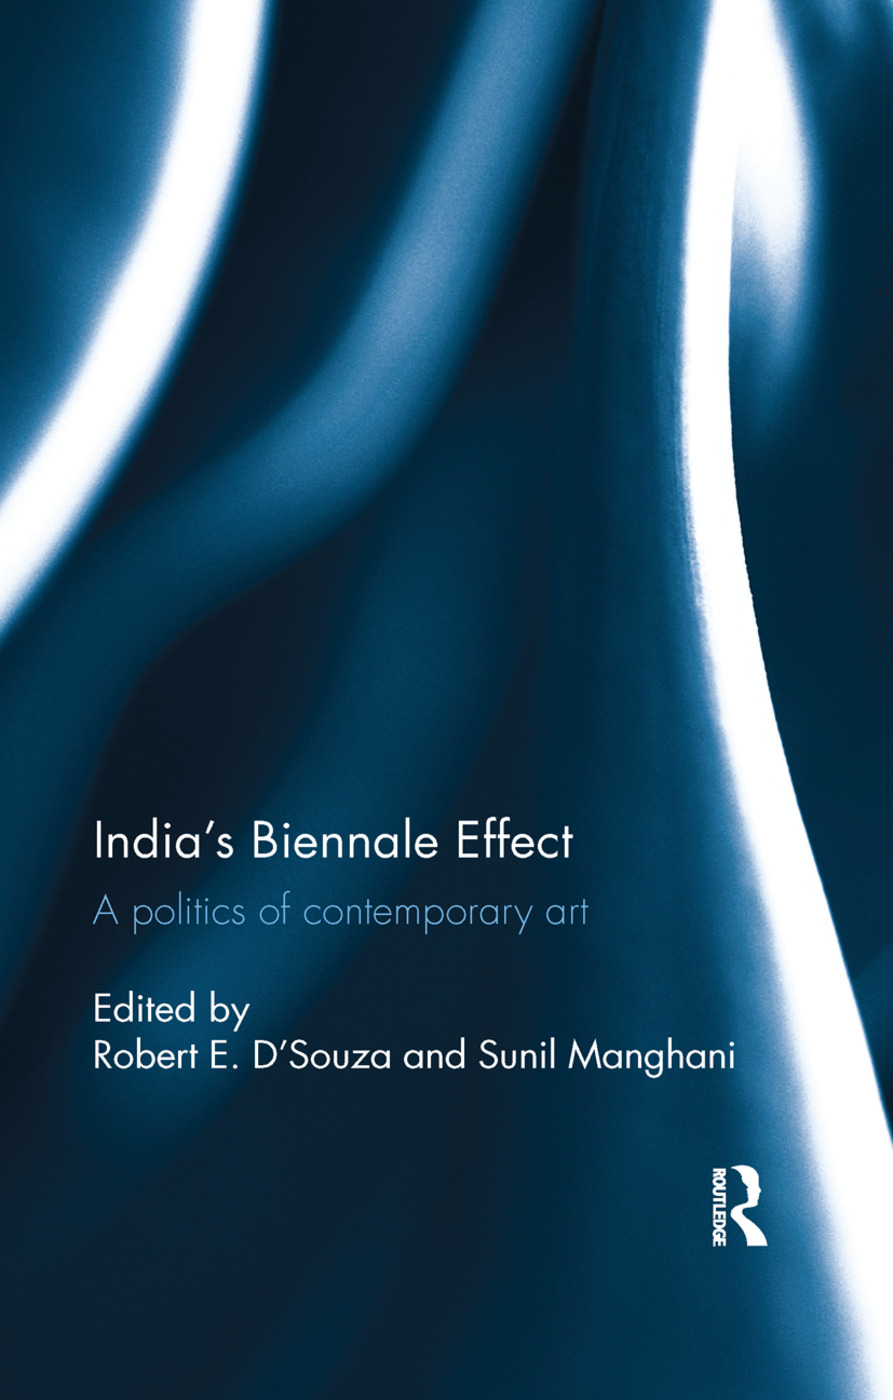 India's Biennale Effect